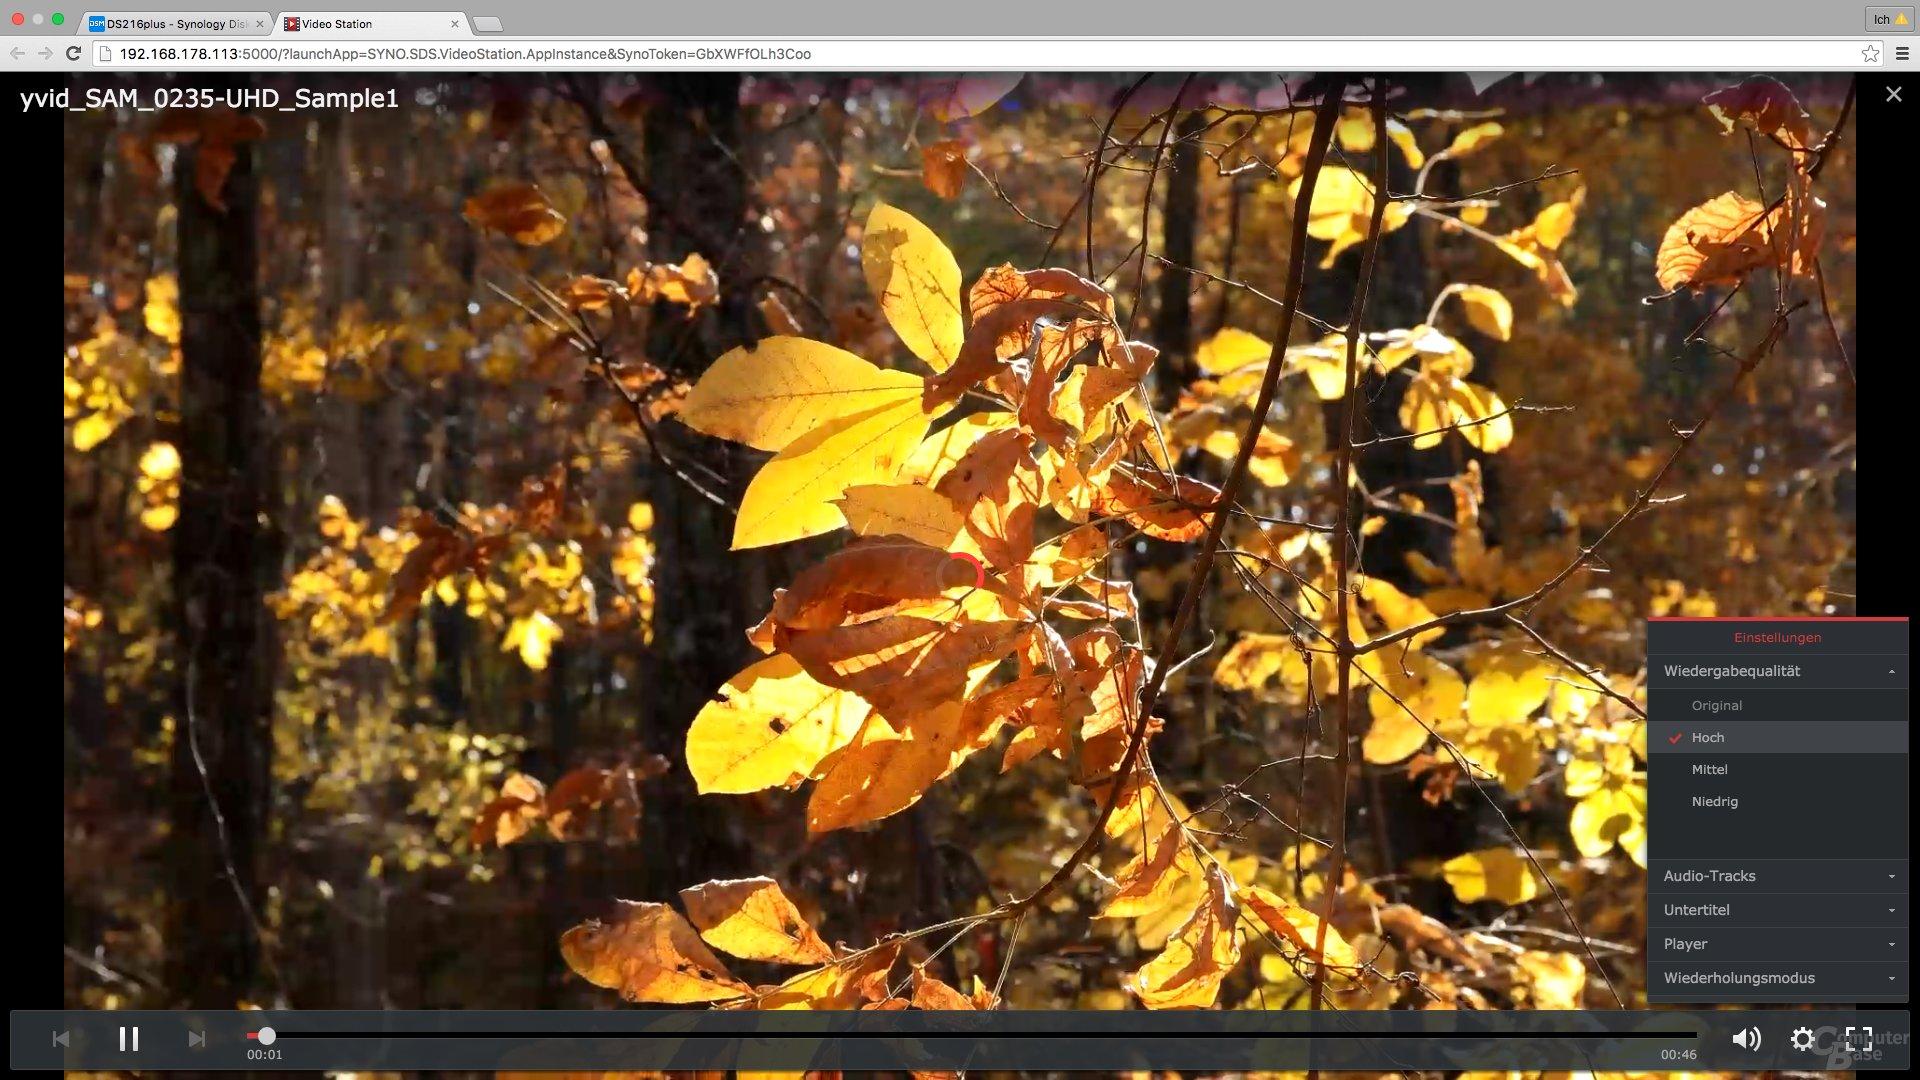 Synology DSM 6.0: Video Station